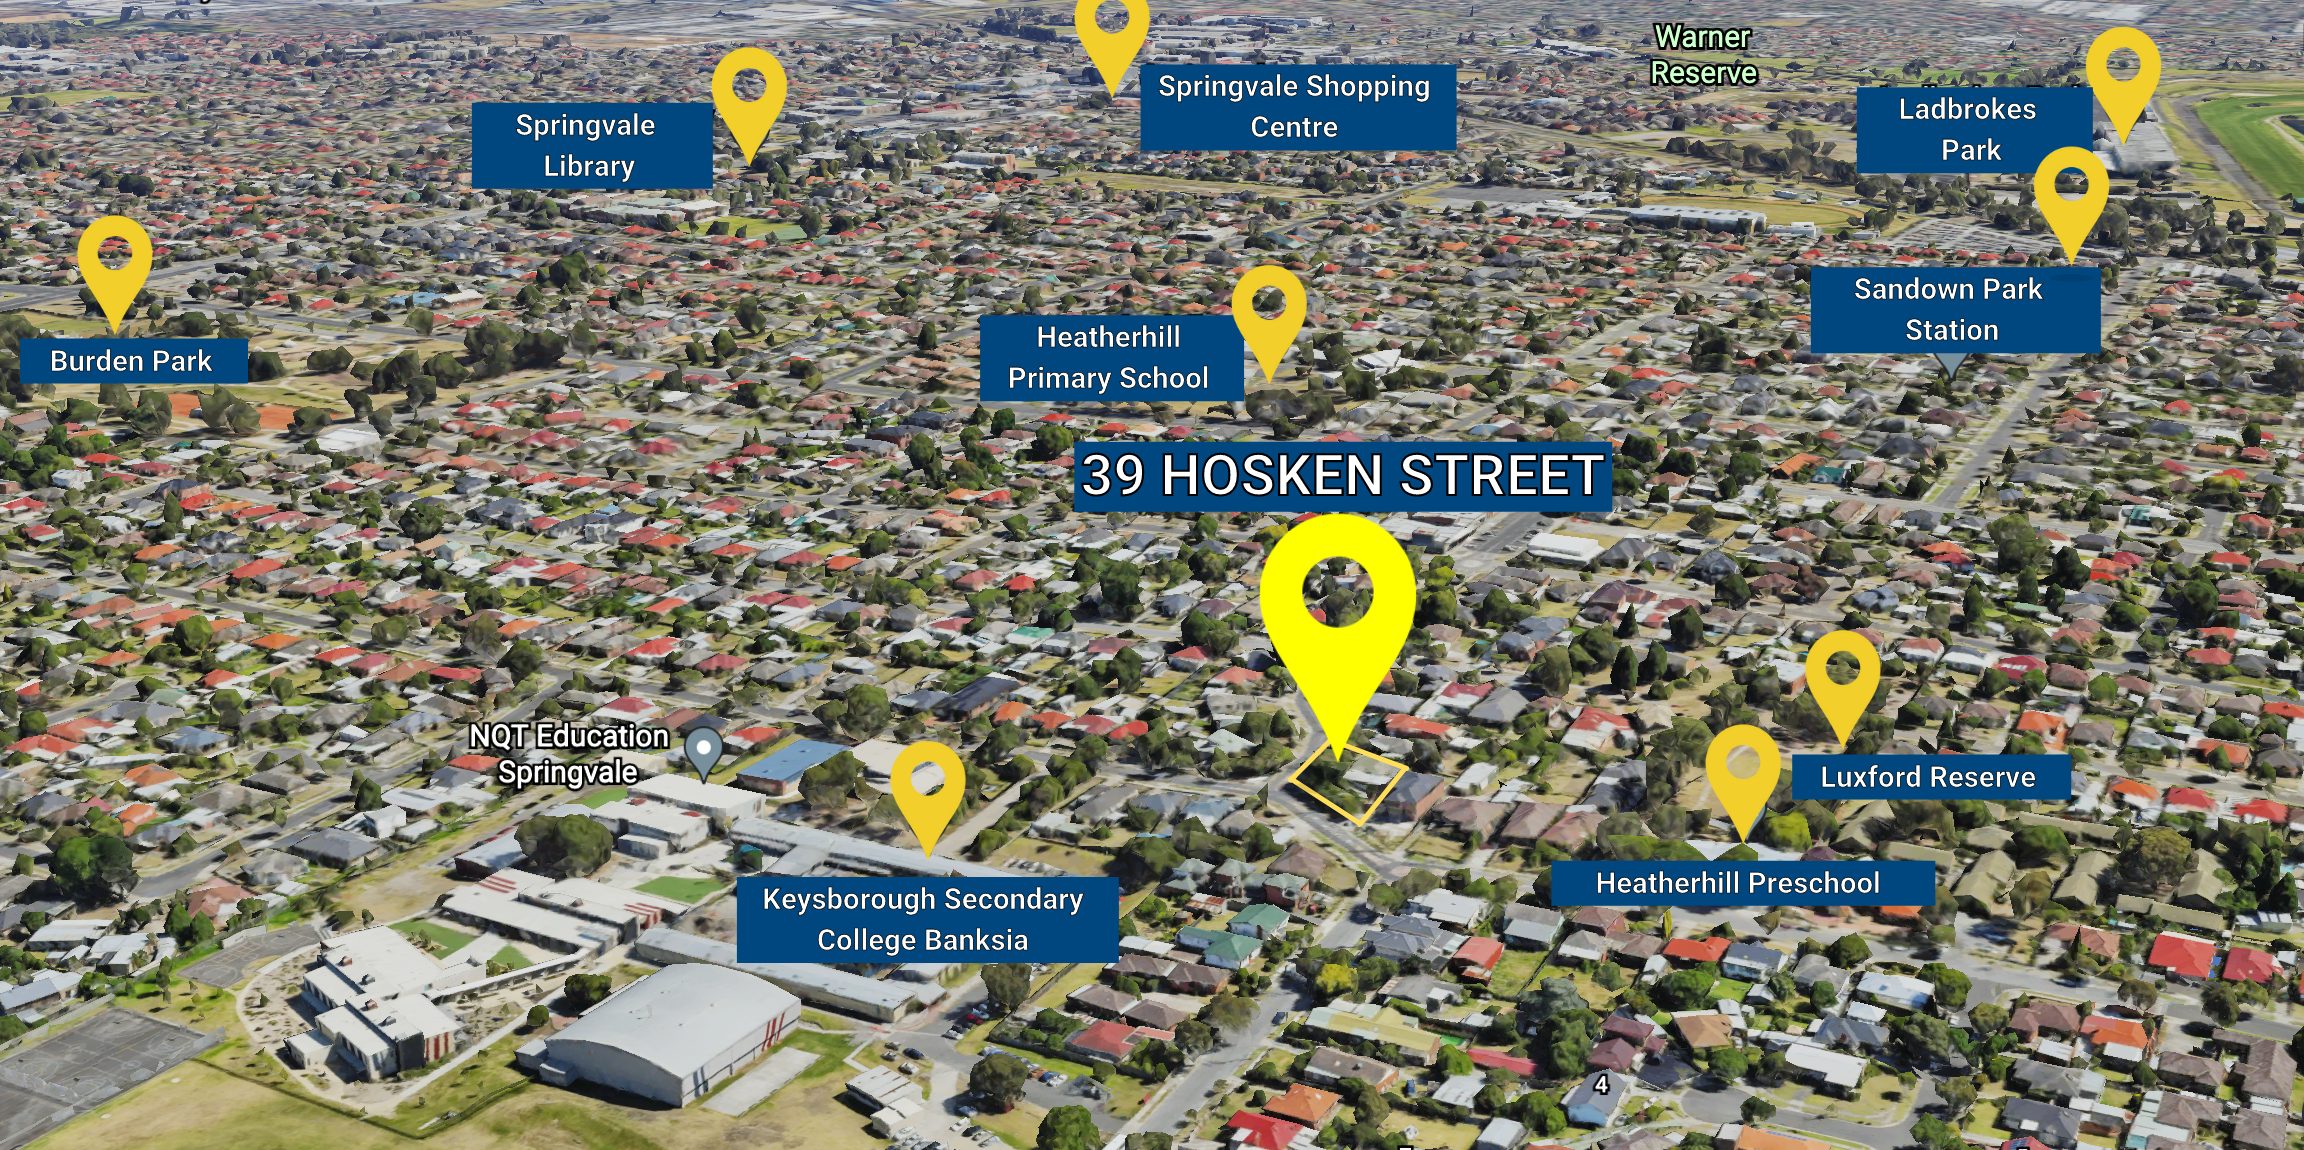 39 Hosken Street, Springvale South, VIC 3172